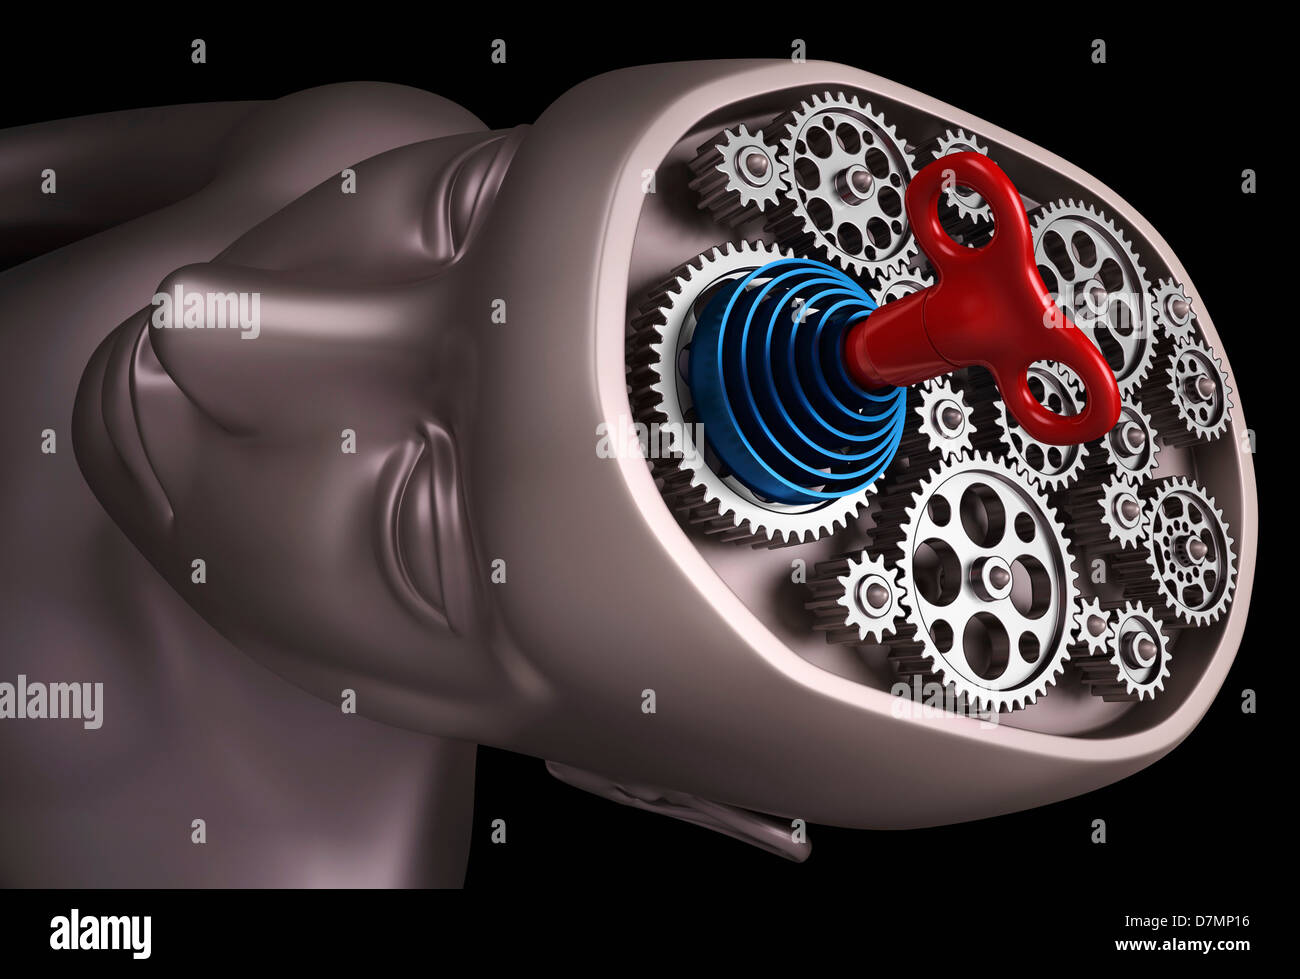 Clockwork brain, ilustraciones Imagen De Stock